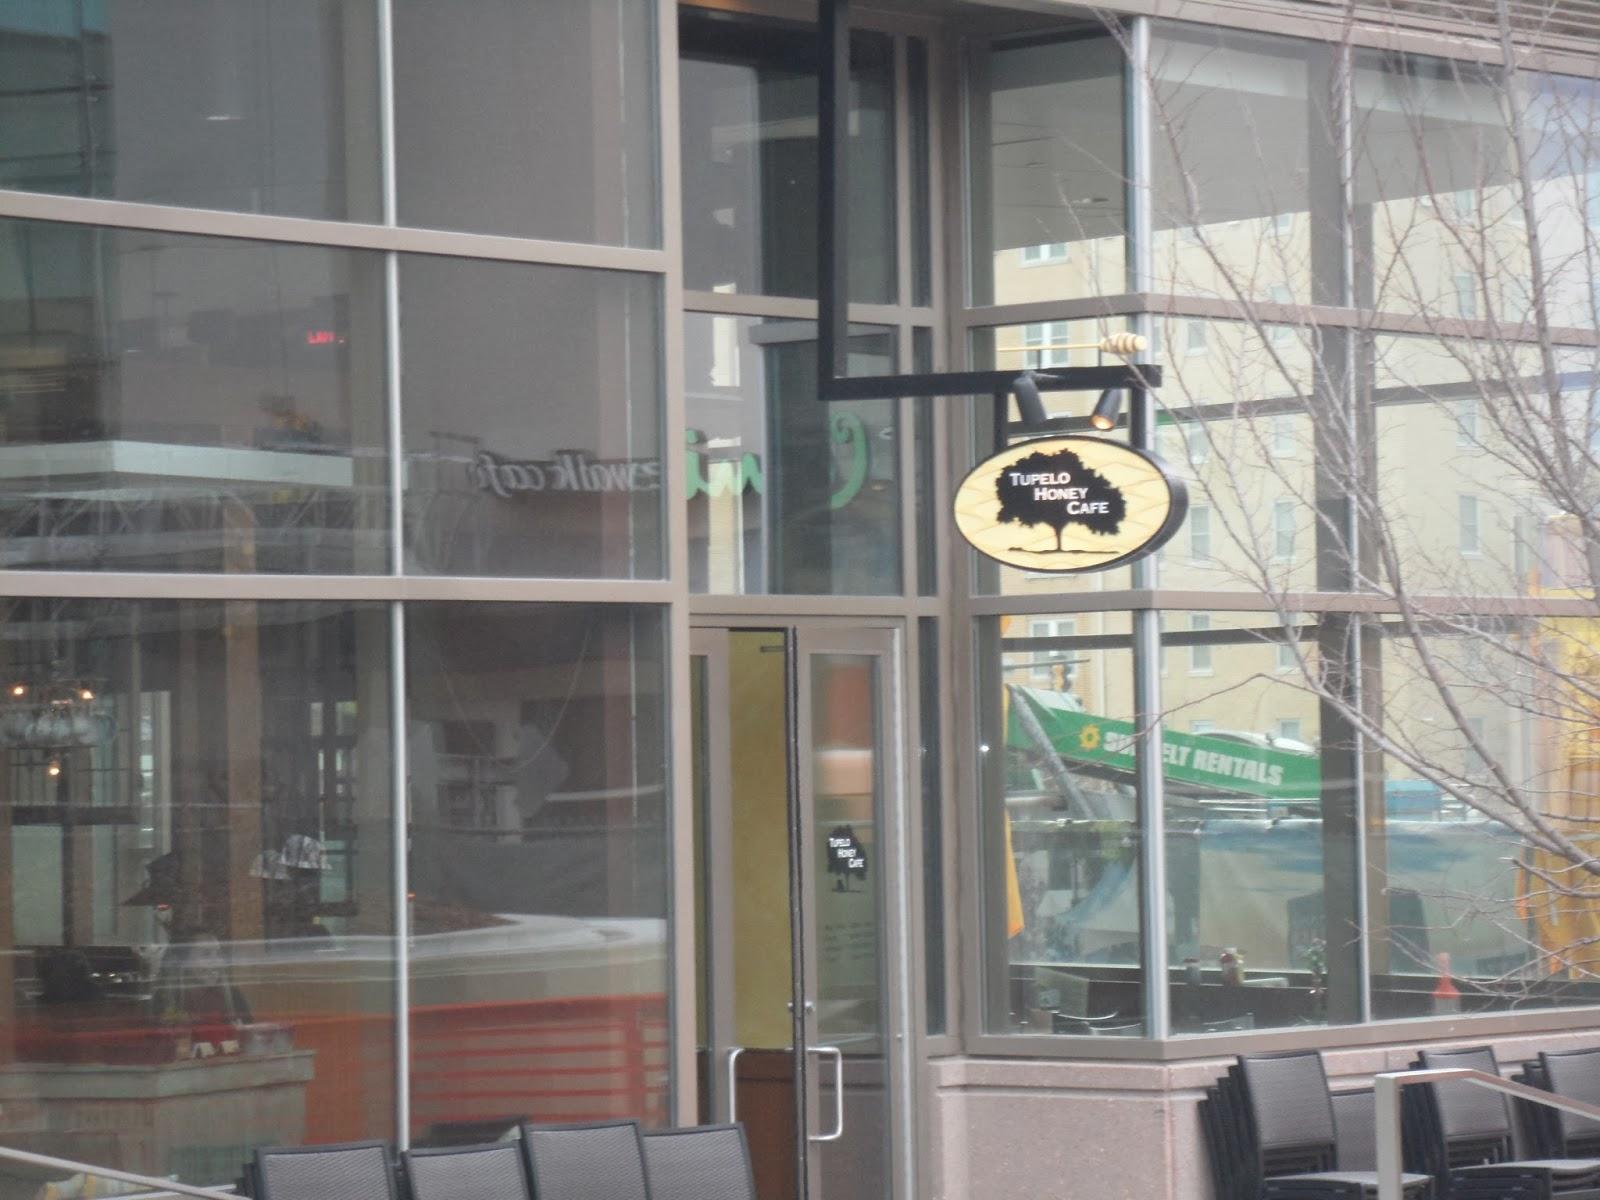 tupelo honey cafe greenville sc